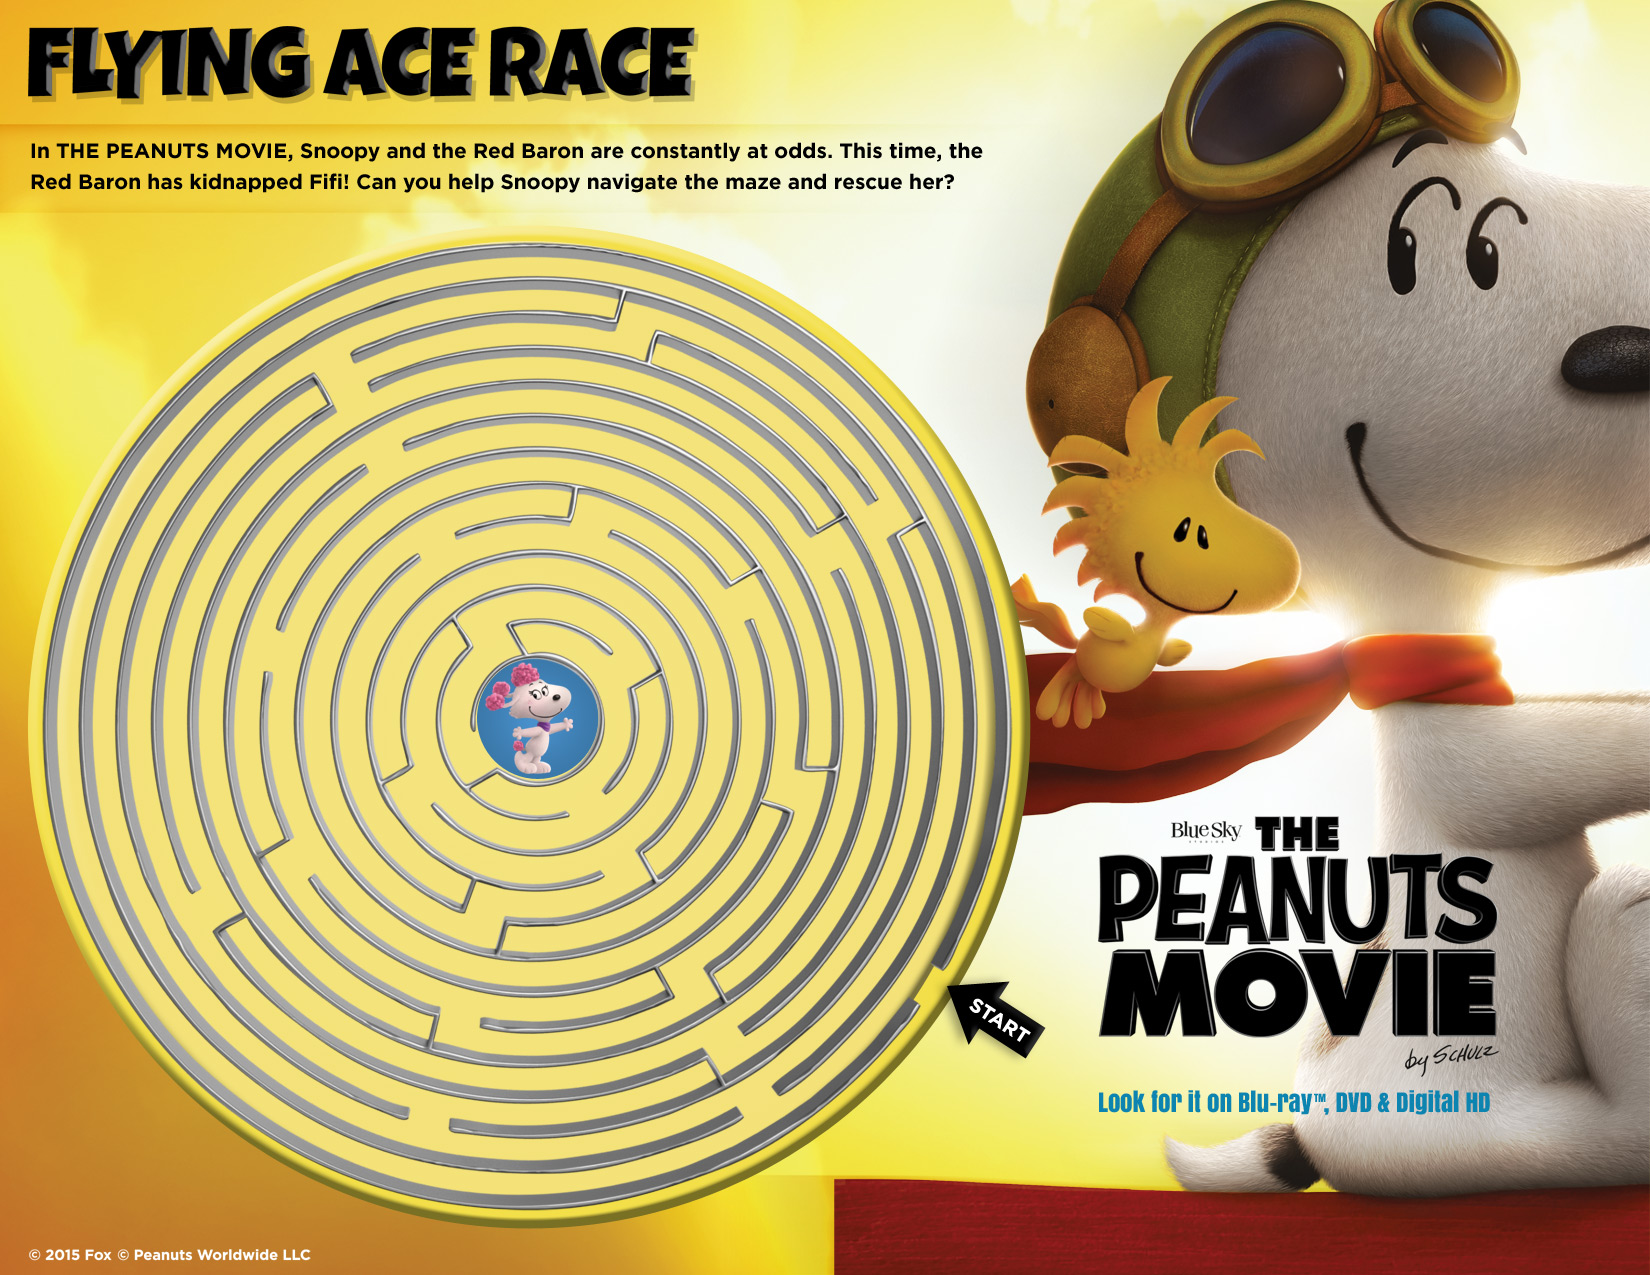 peanuts_toolkit_activities_flyingacerace